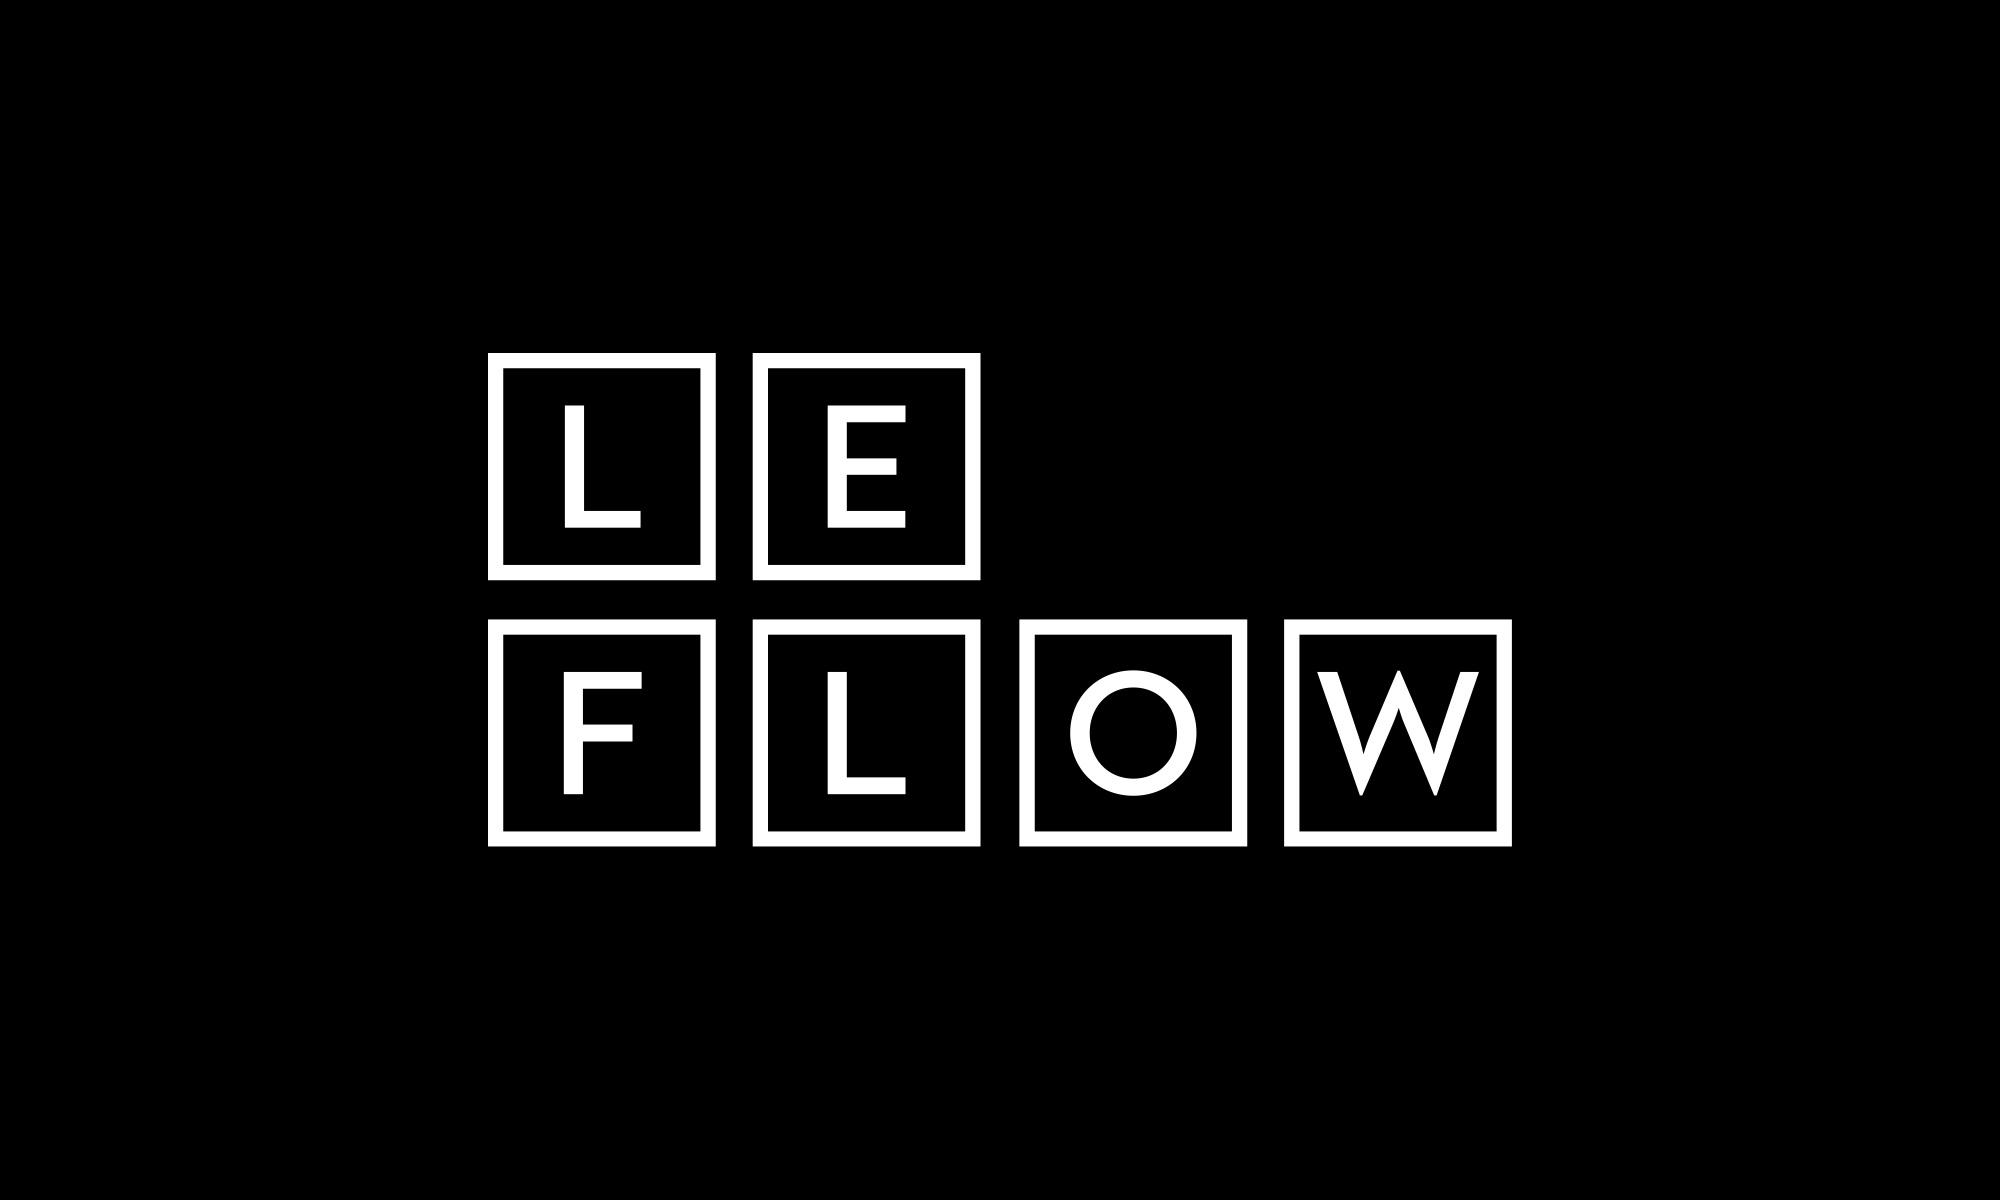 Le Flow wordmark